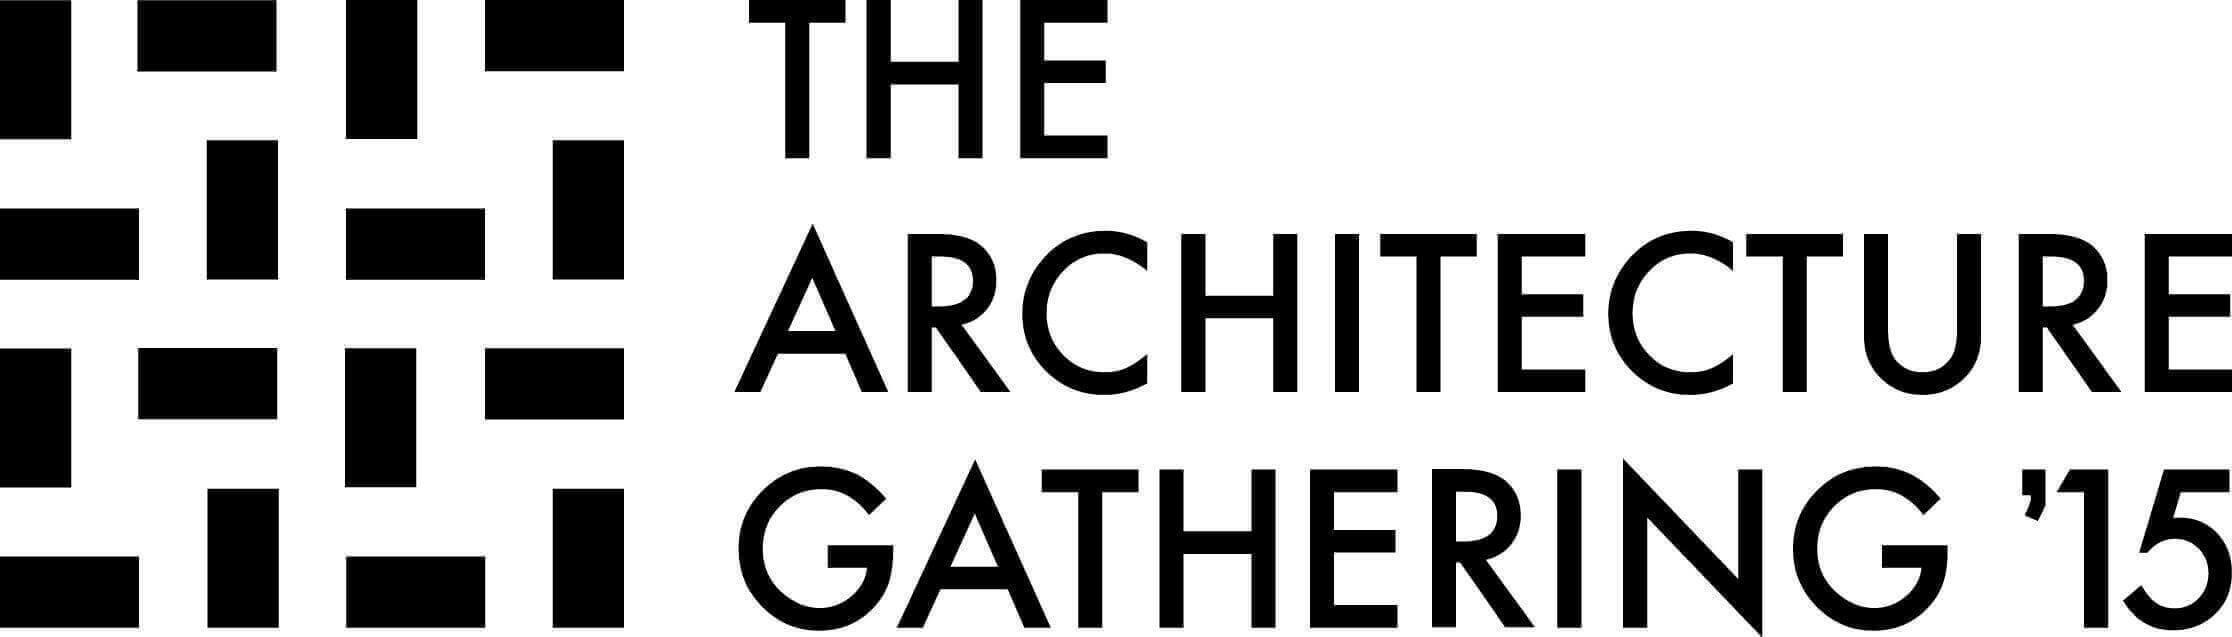 The Architecture Gathering 2015 - Logo